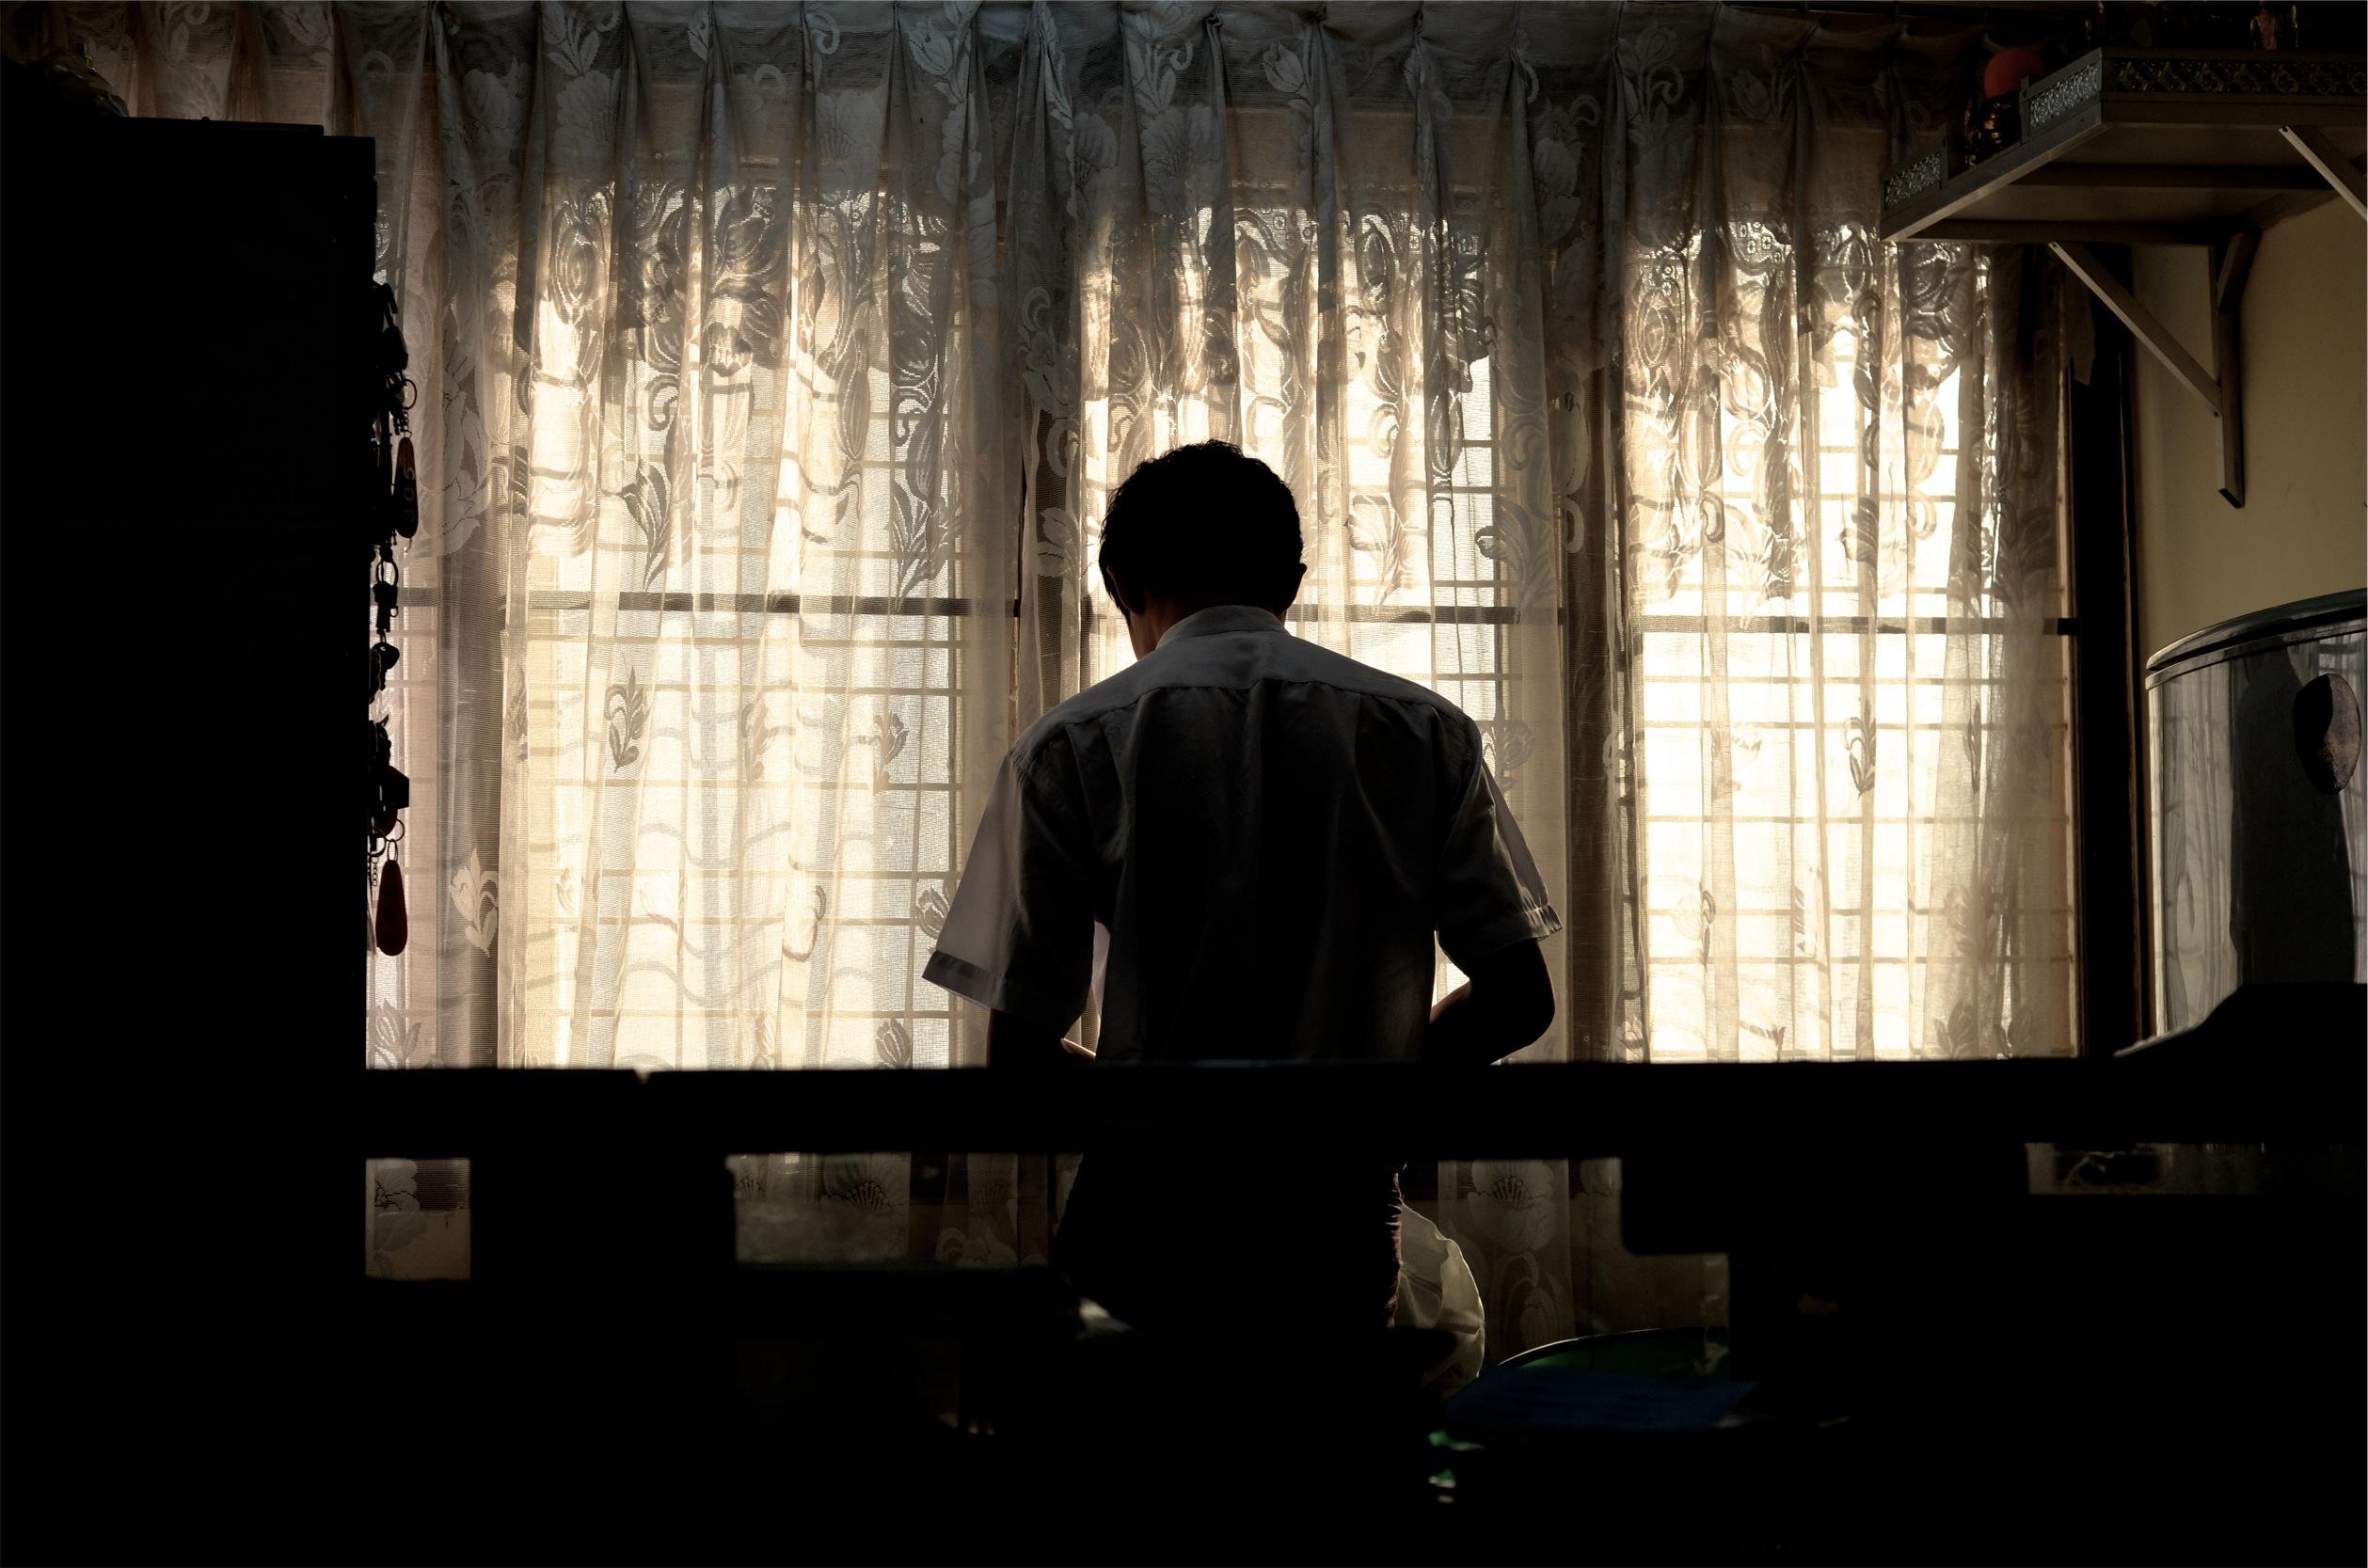 Man Writing Curtain